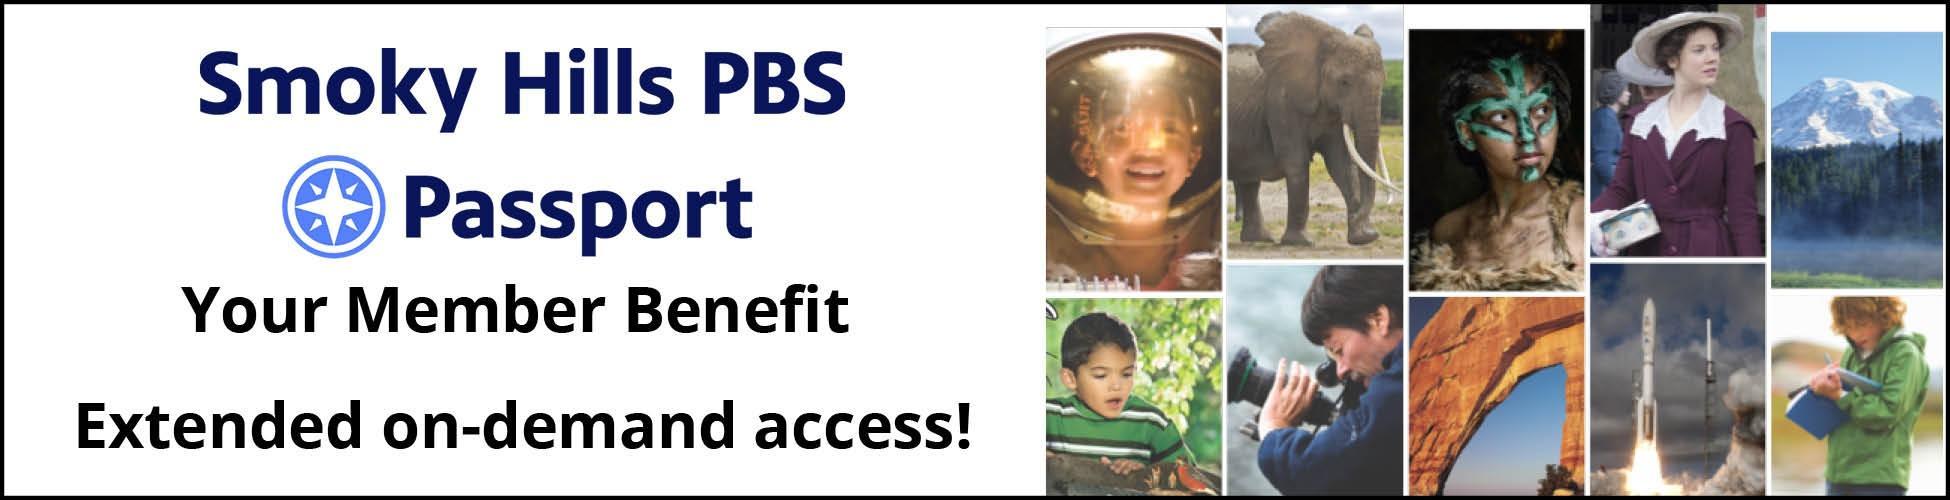 Smoky Hills PBS PASSPORT service